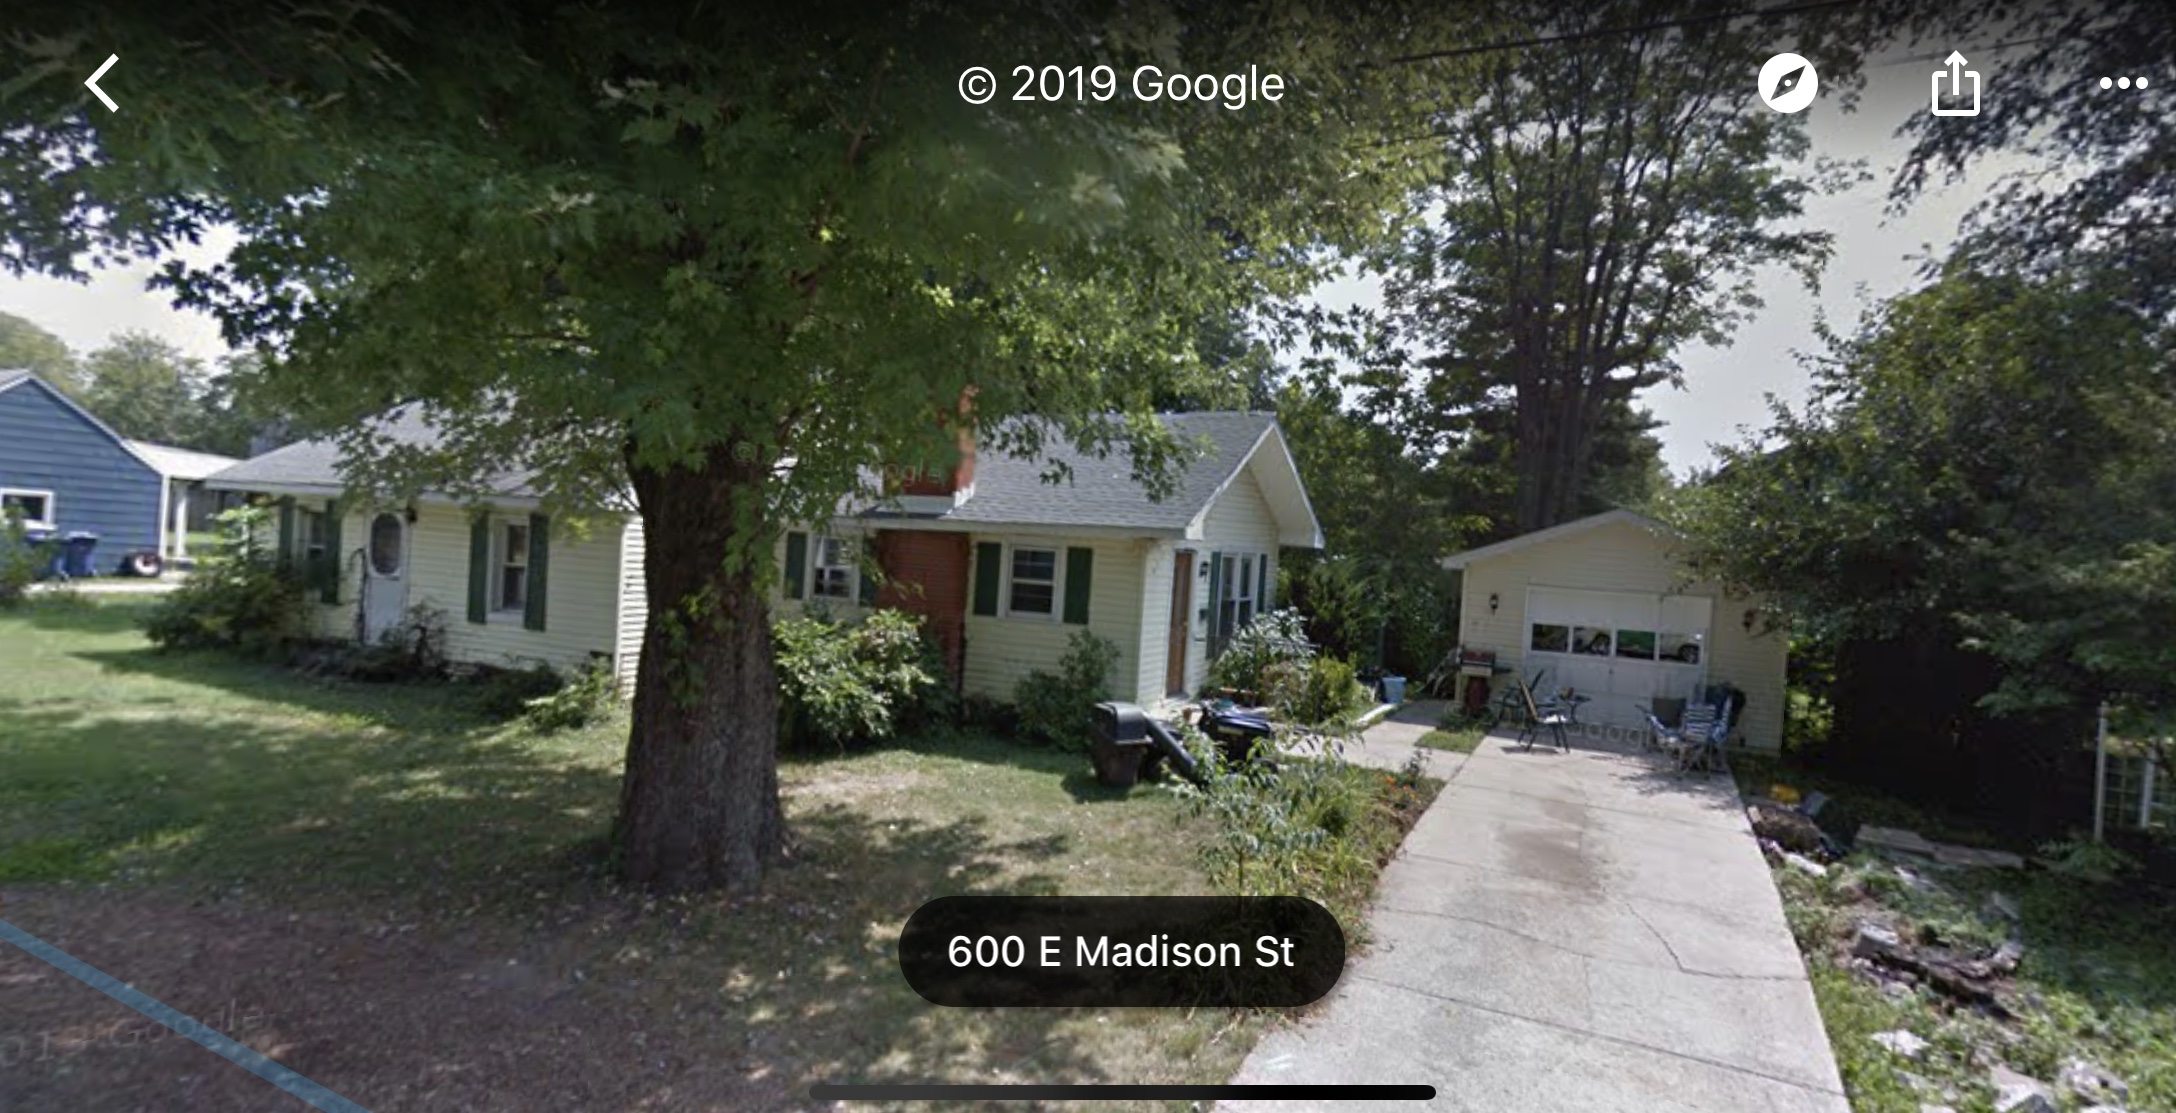 207 Birch St, La Grange, KY